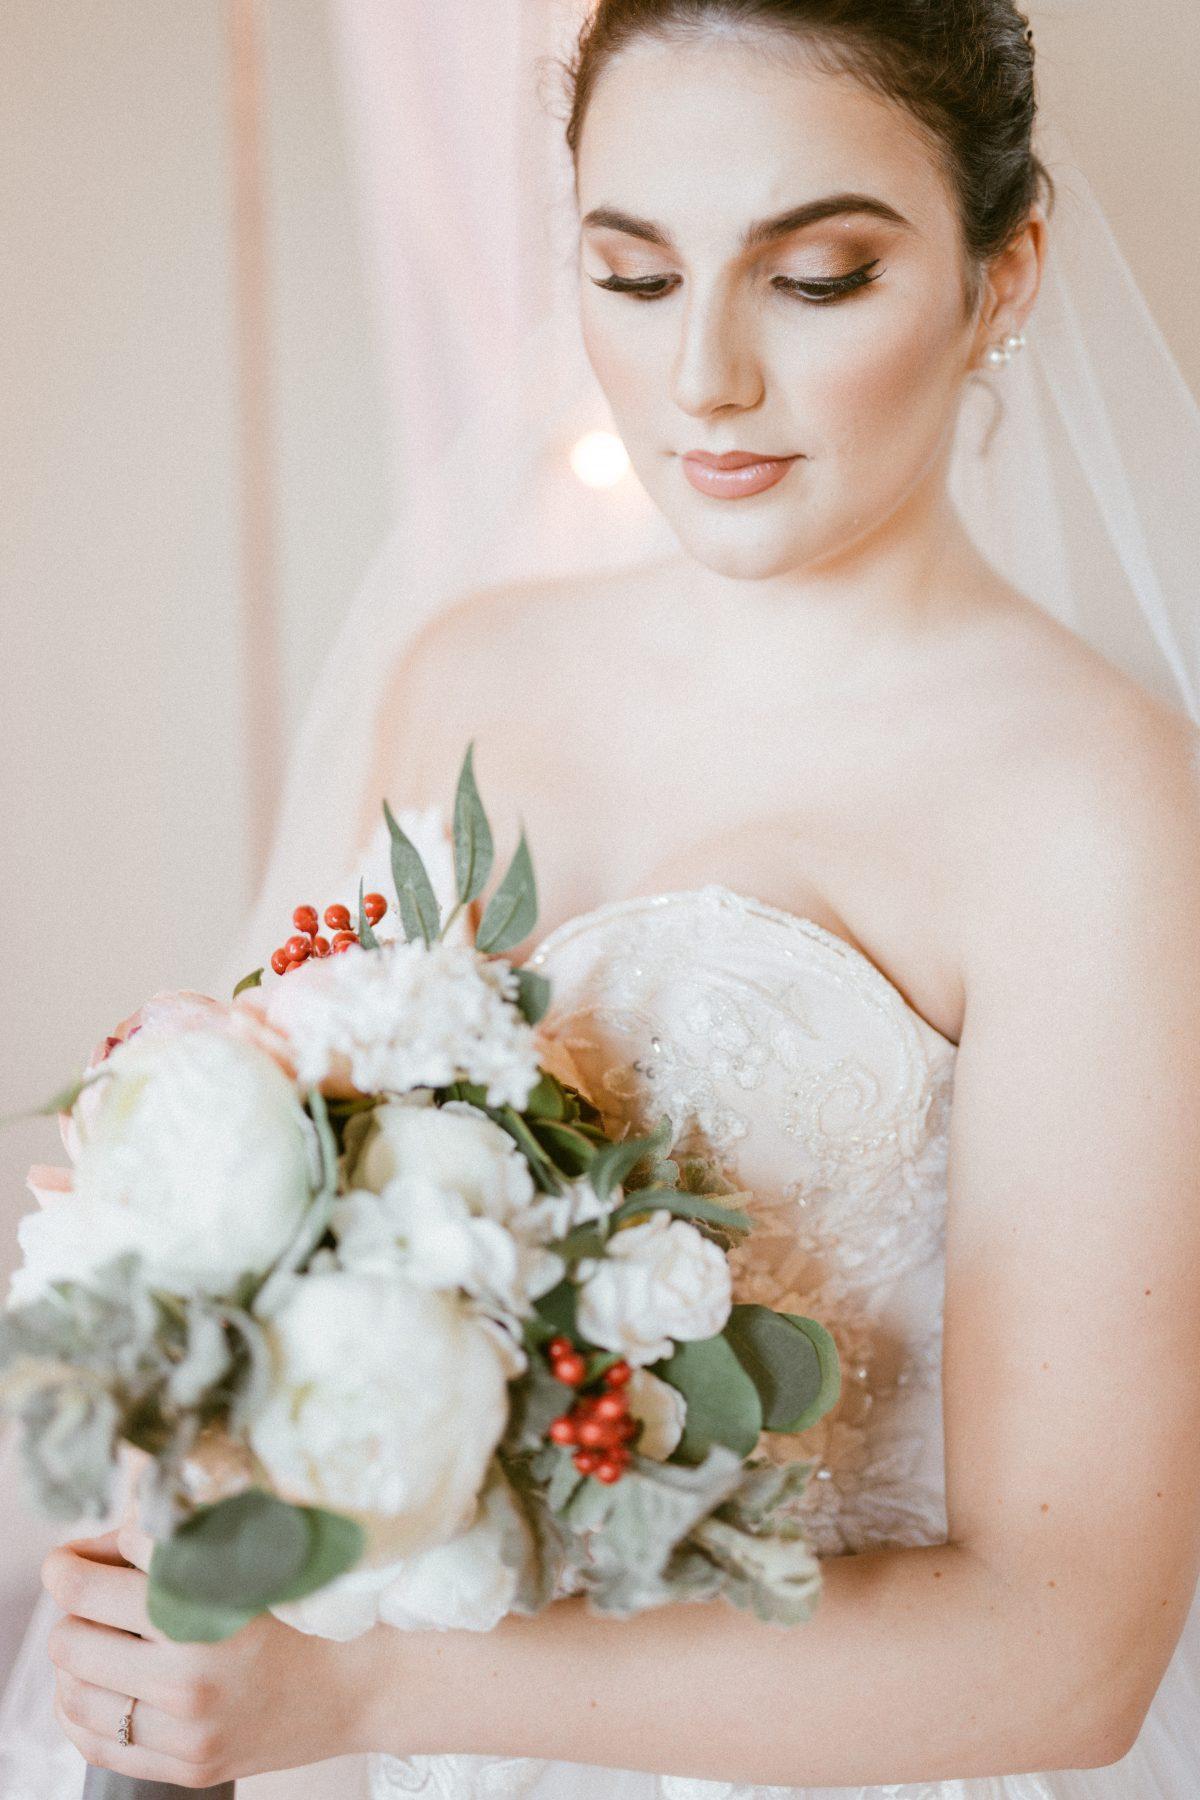 Mings-Photography-Industrial-Elegant-Bridal-Editorial-09.jpg